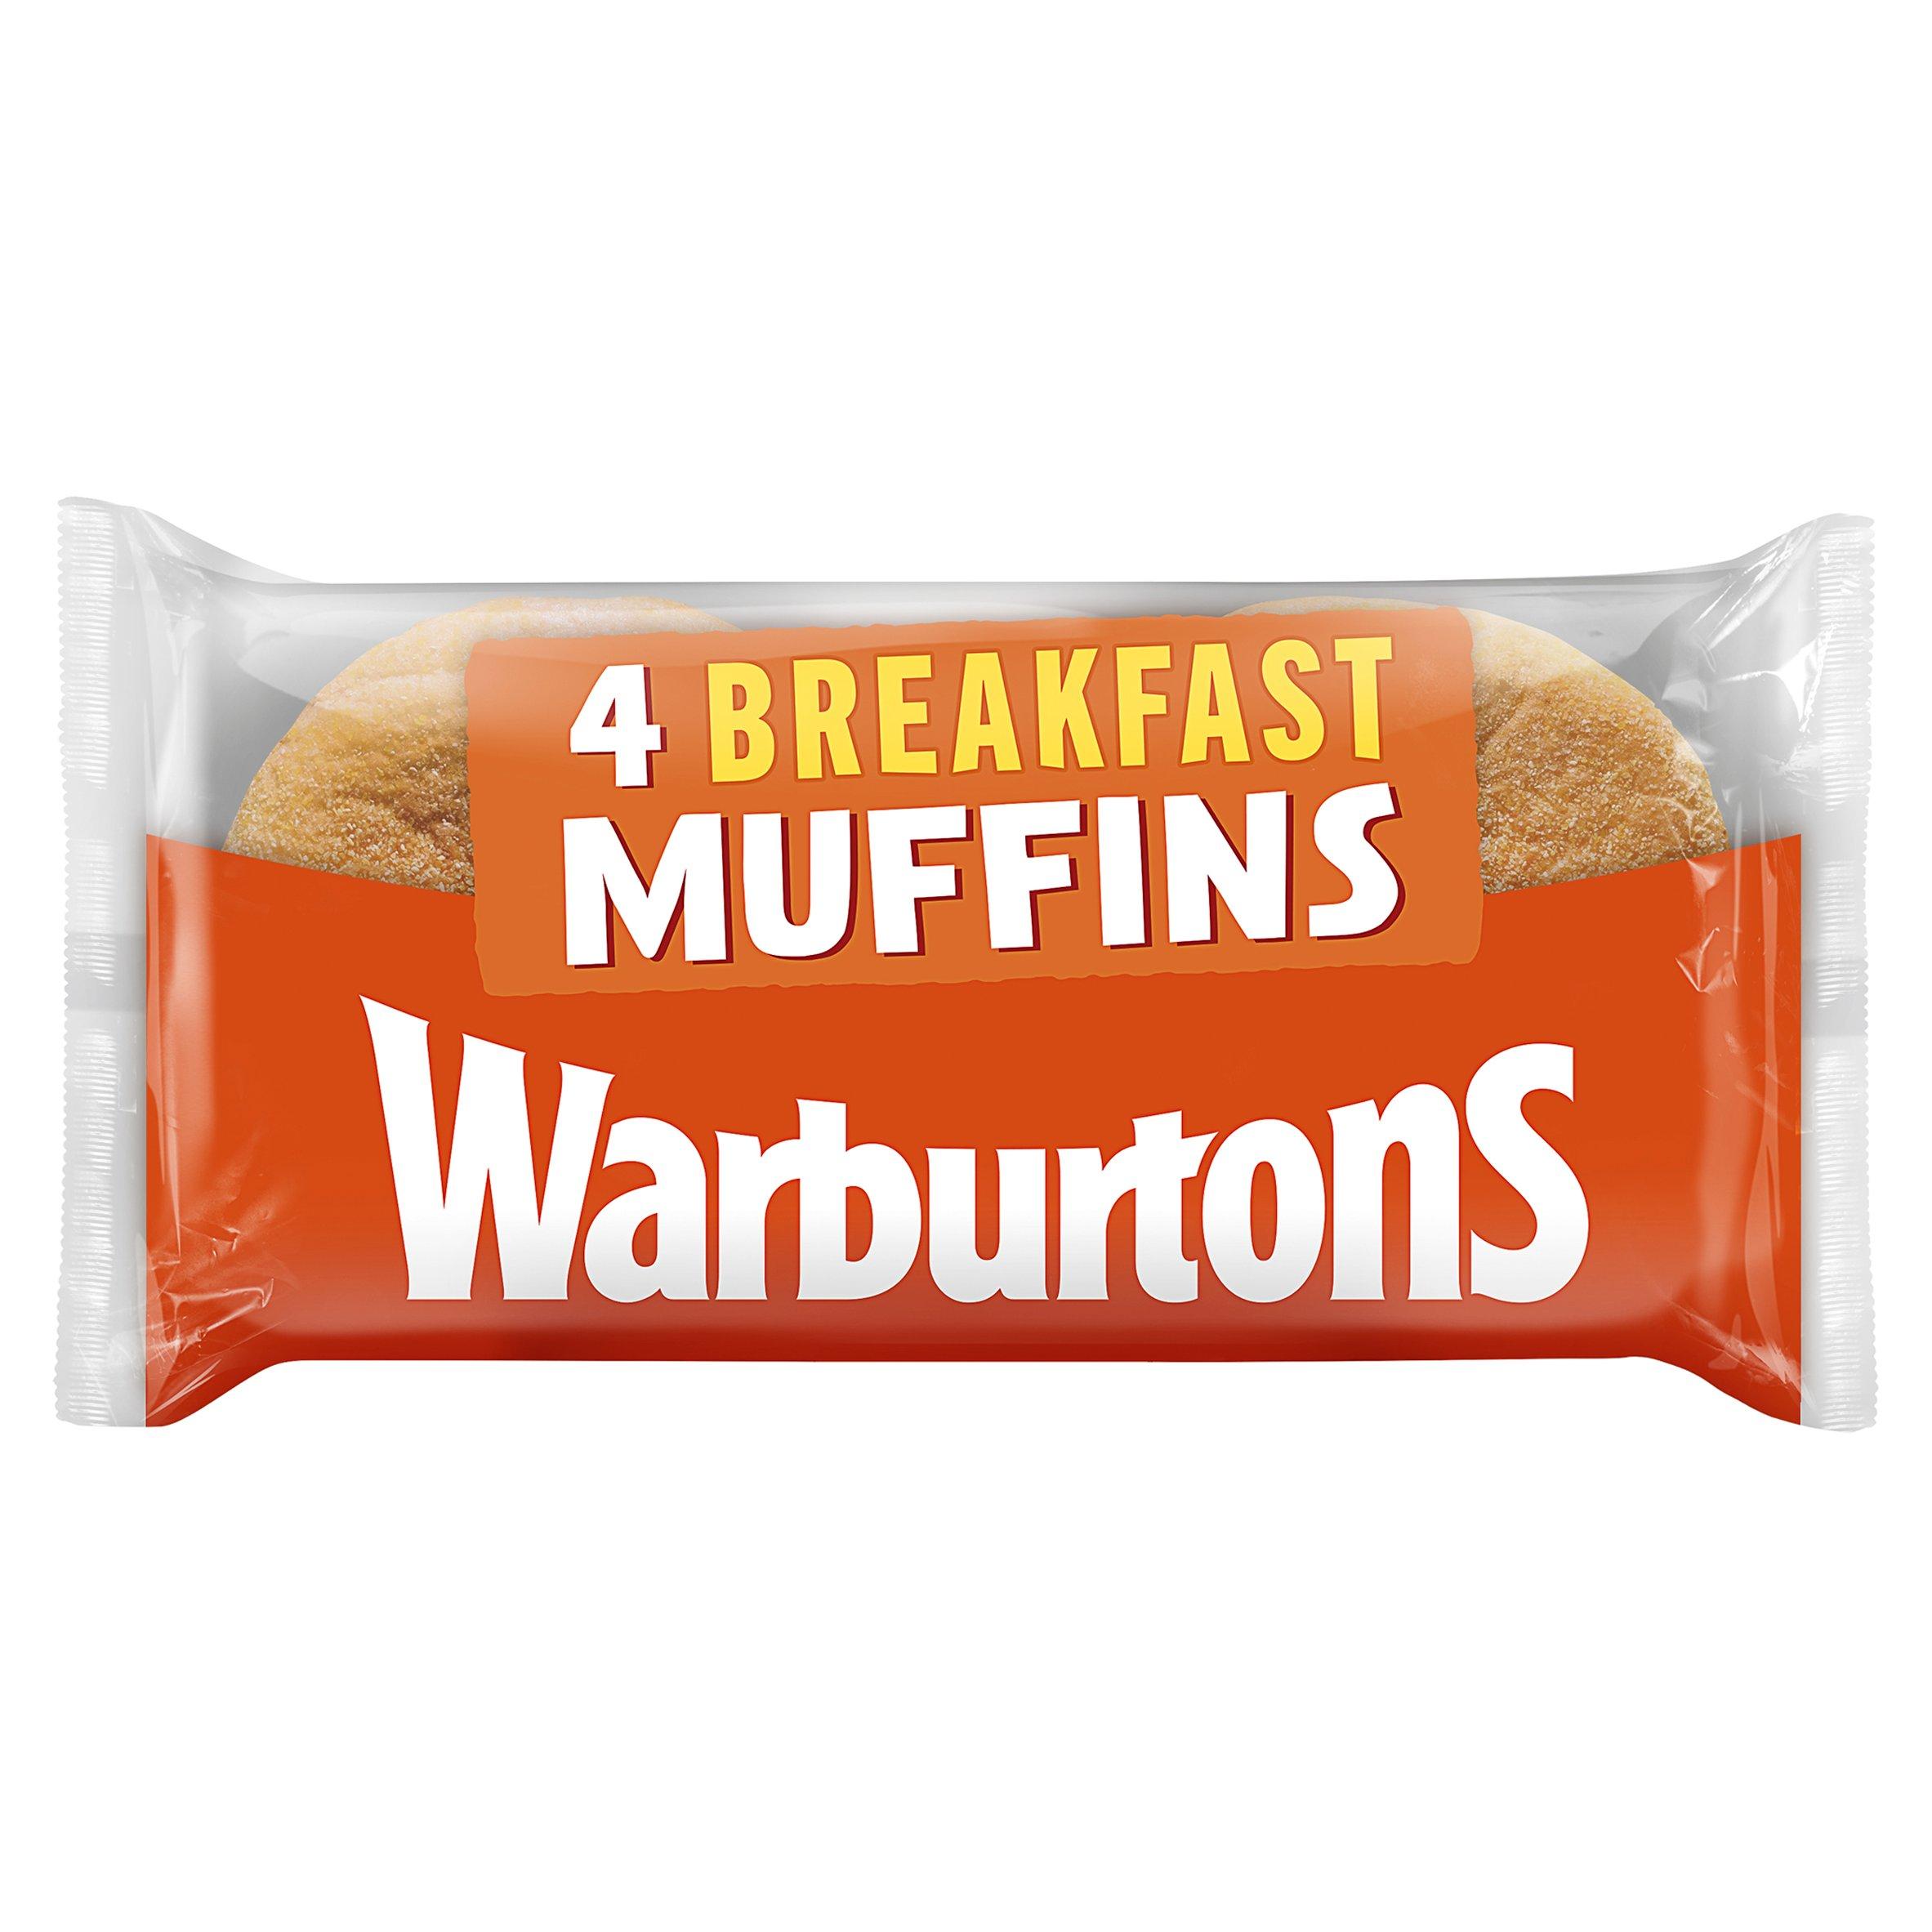 Warburtons Breakfast Muffins 4 Pack